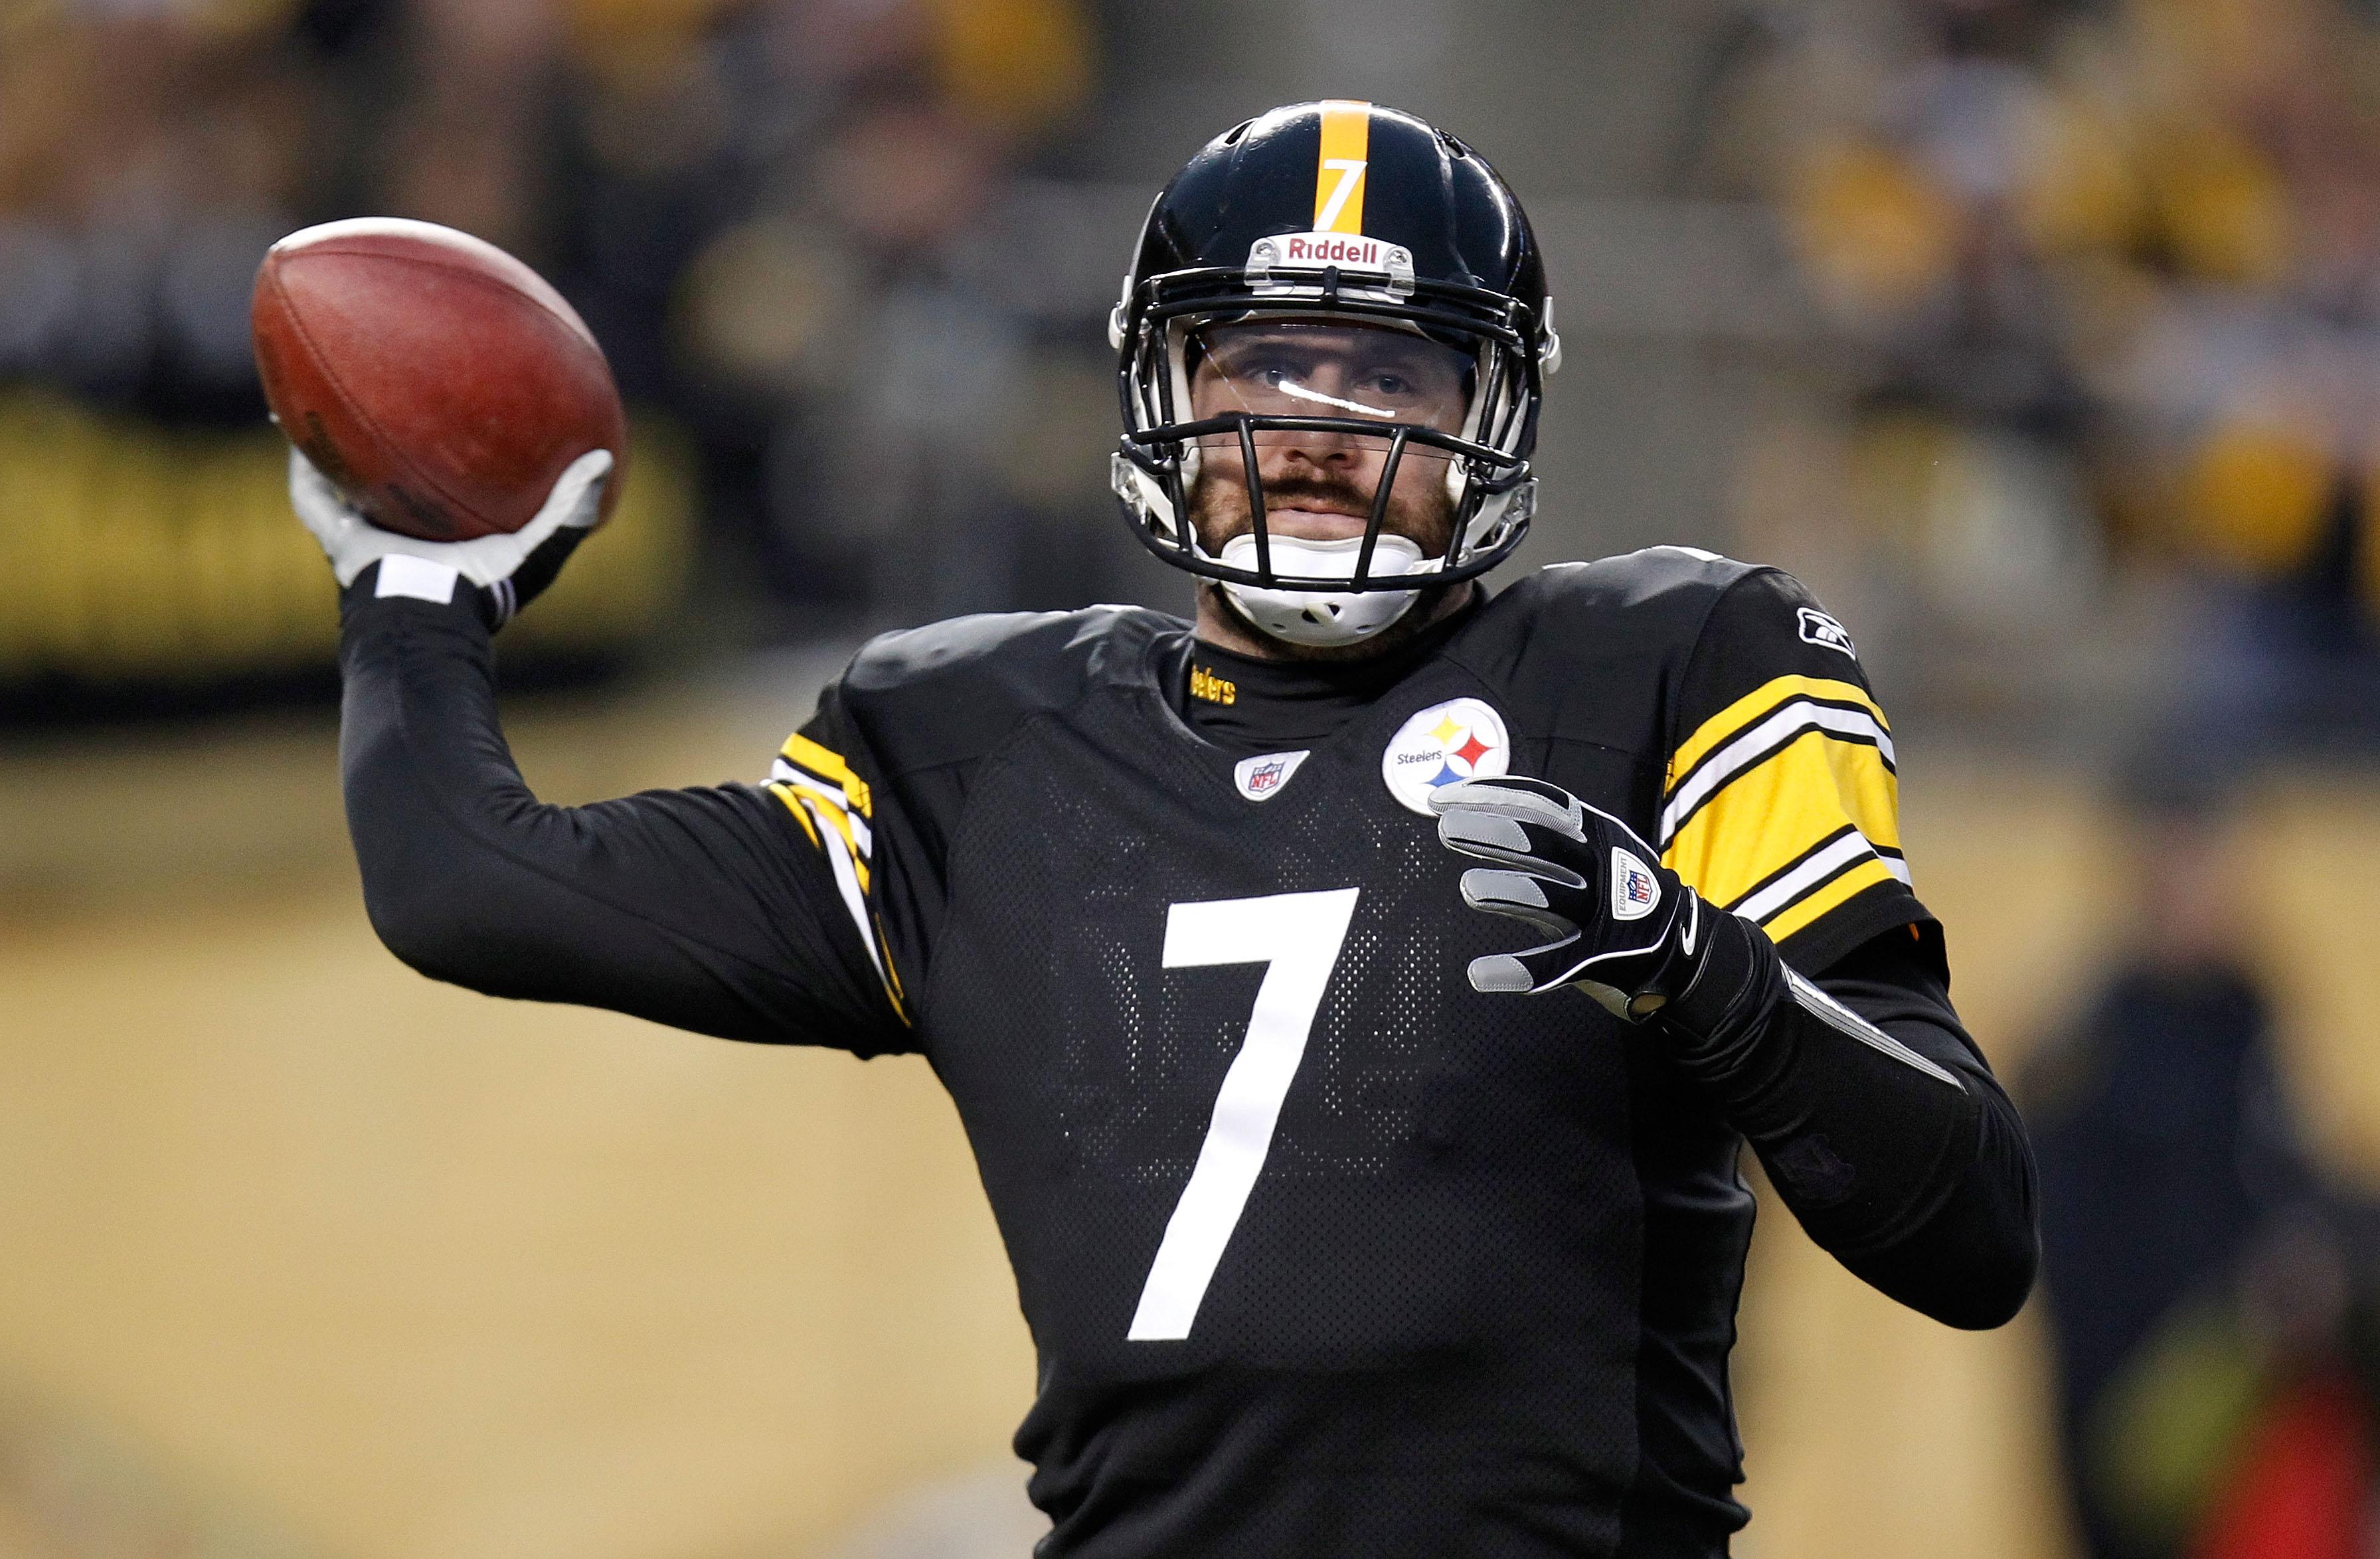 321548c70b7 PITTSBURGH, PA - JANUARY 15: Quarterback Ben Roethlisberger #7 of the  Pittsburgh Steelers